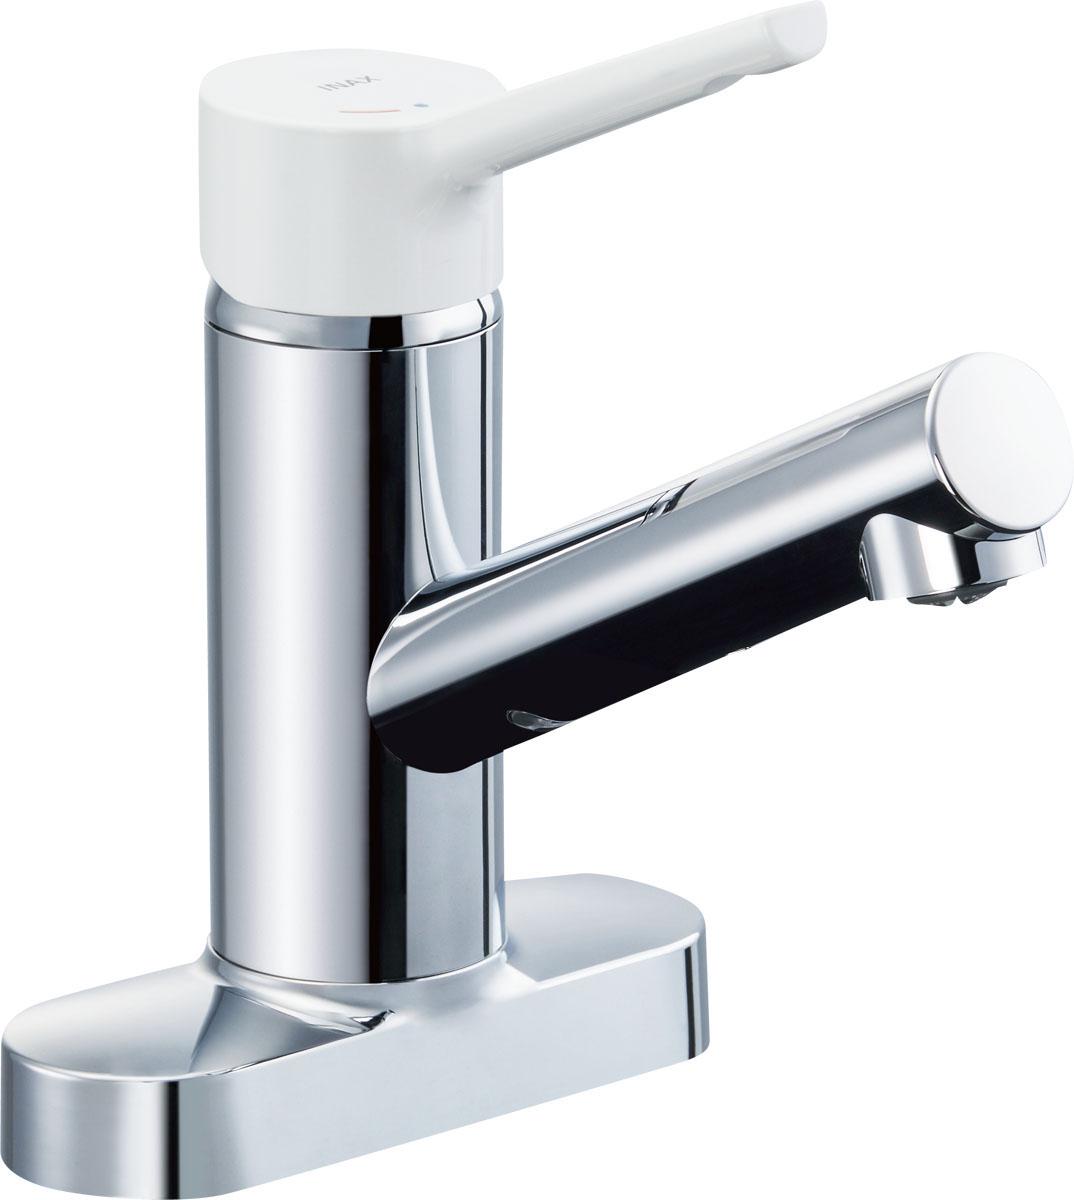 INAX LIXIL キッチン水栓 SF-WL438SYN (155) キッチン用水栓金具 ツーホールタイプ ノルマーレS (ミニキッチン用) シングルレバー混合水栓 寒冷地対応商品 [イナックス・リクシル]